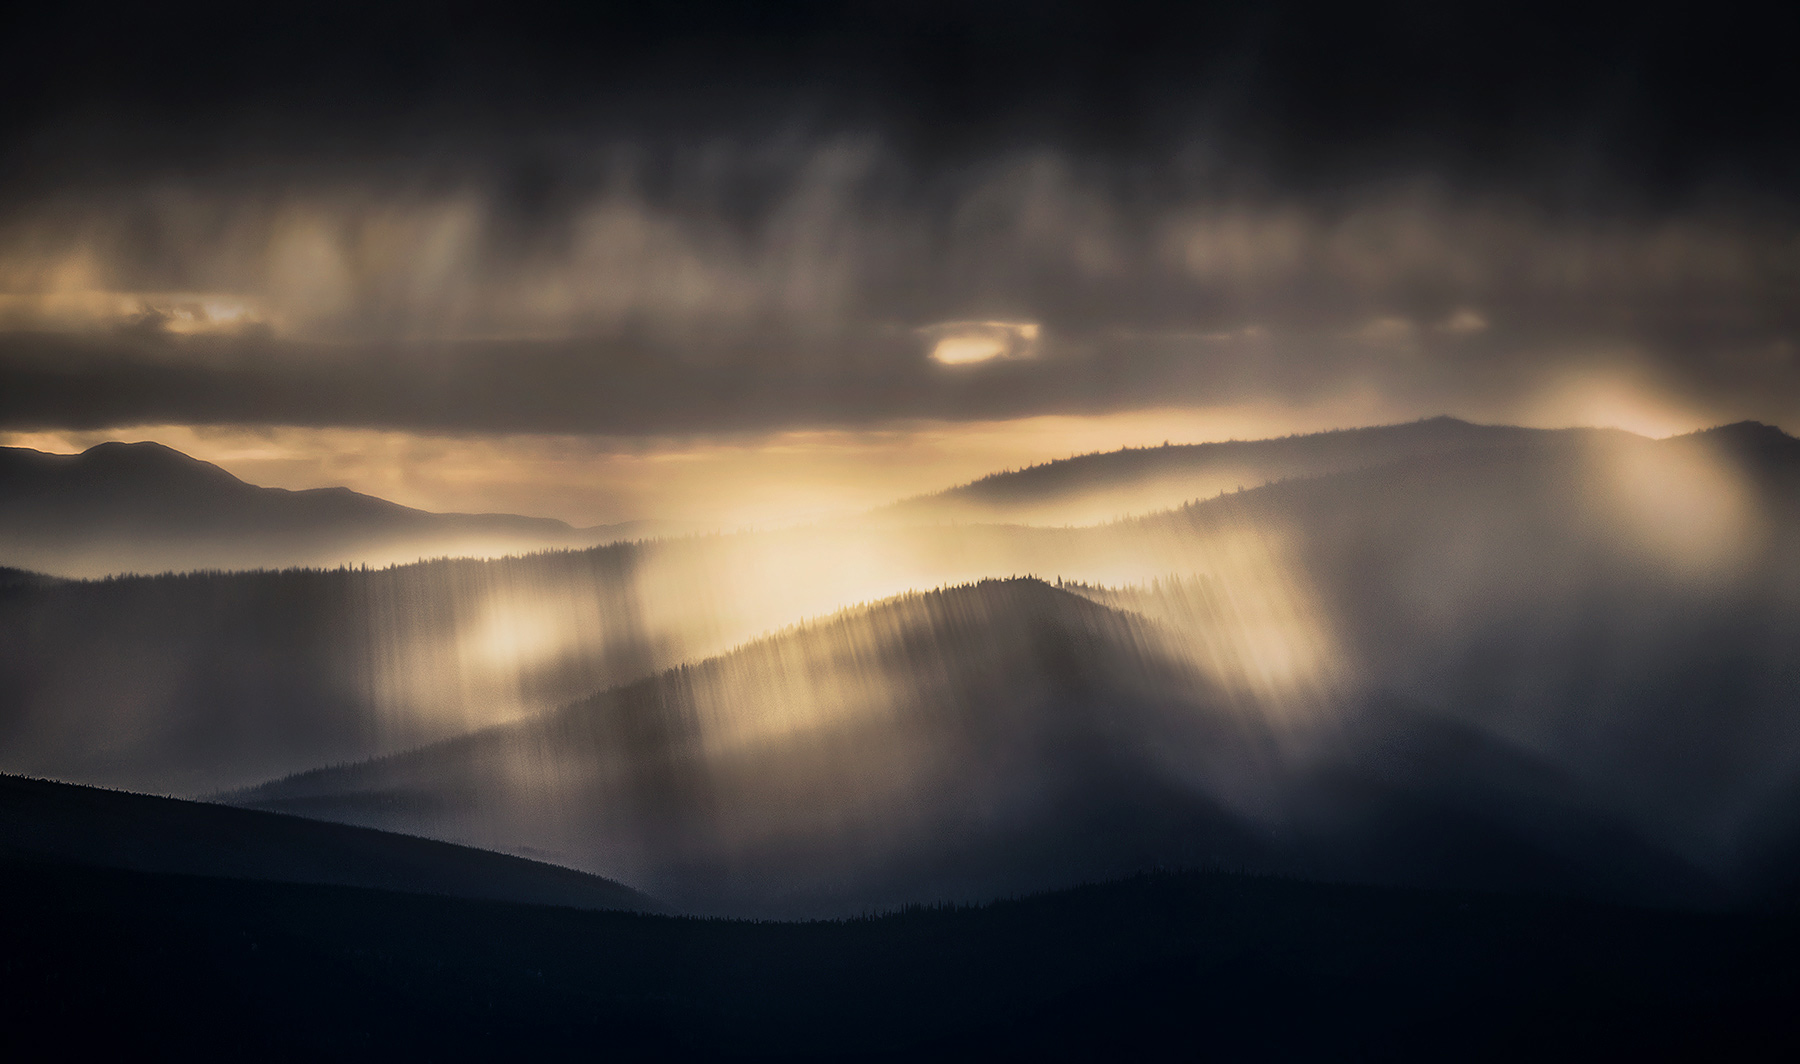 sky, light, peaceful, beams, god, Yukon, boreal, forest, photo